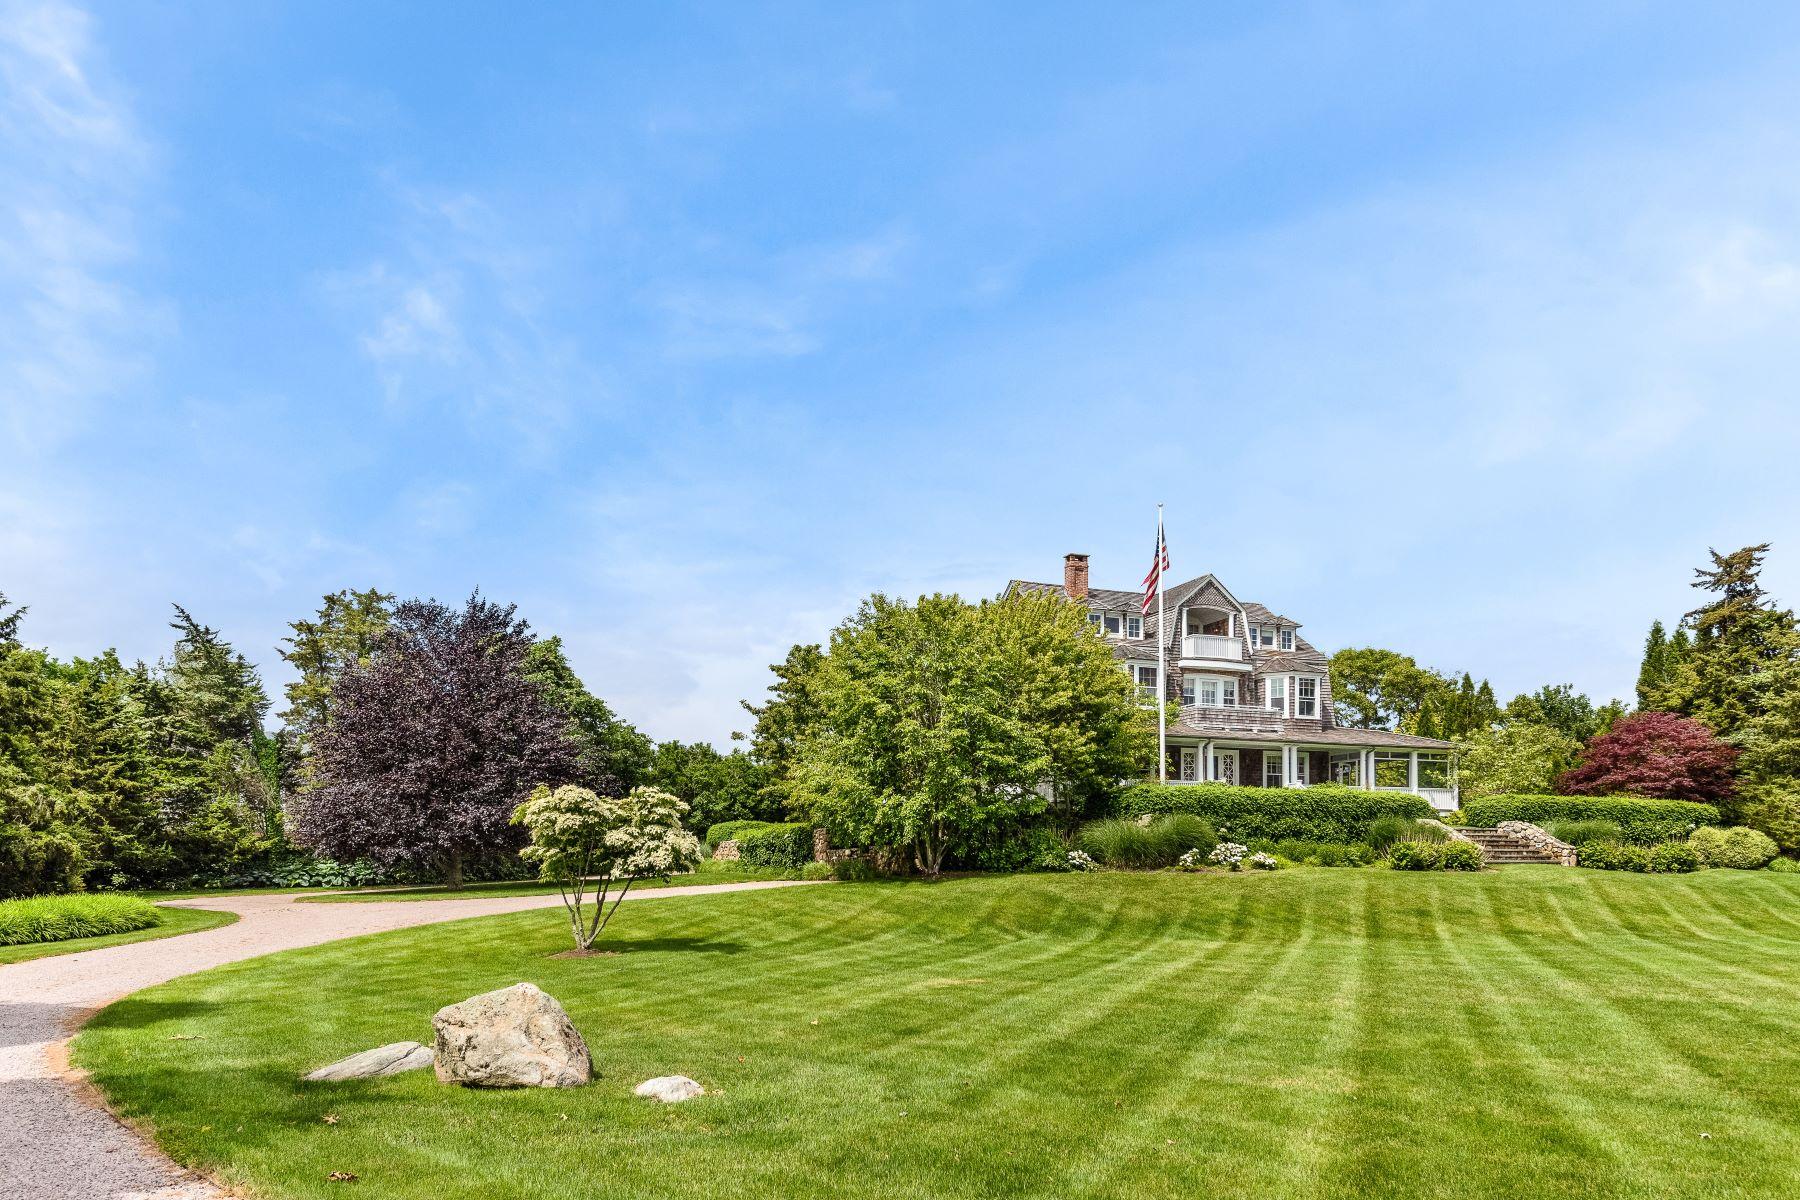 Single Family Homes for Sale at 2 Ninigret Avenue, Westerly, RI 2 Ninigret Avenue Westerly, Rhode Island 02891 United States